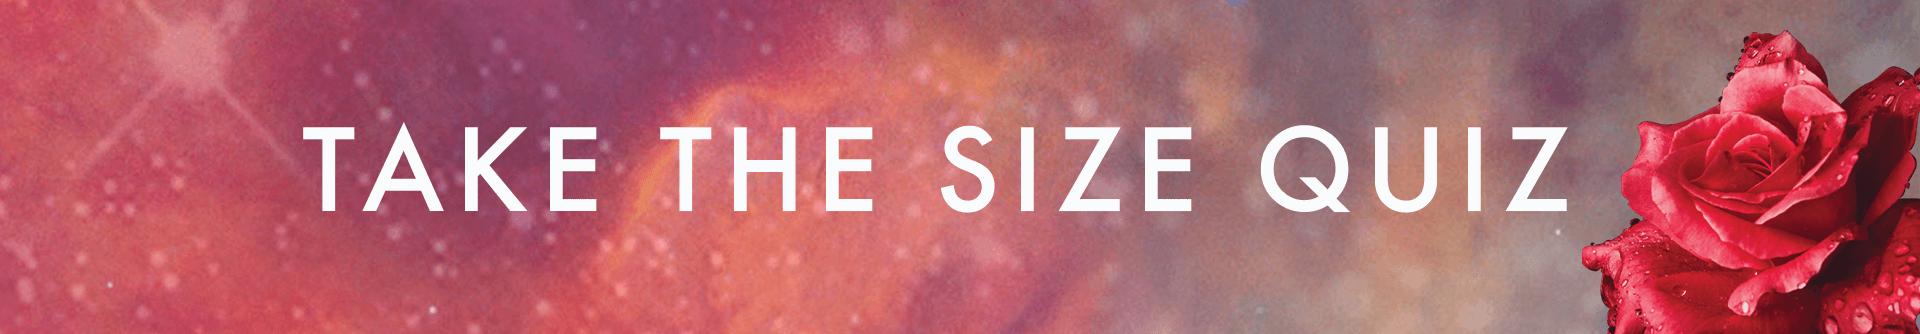 Take-the-size-quiz